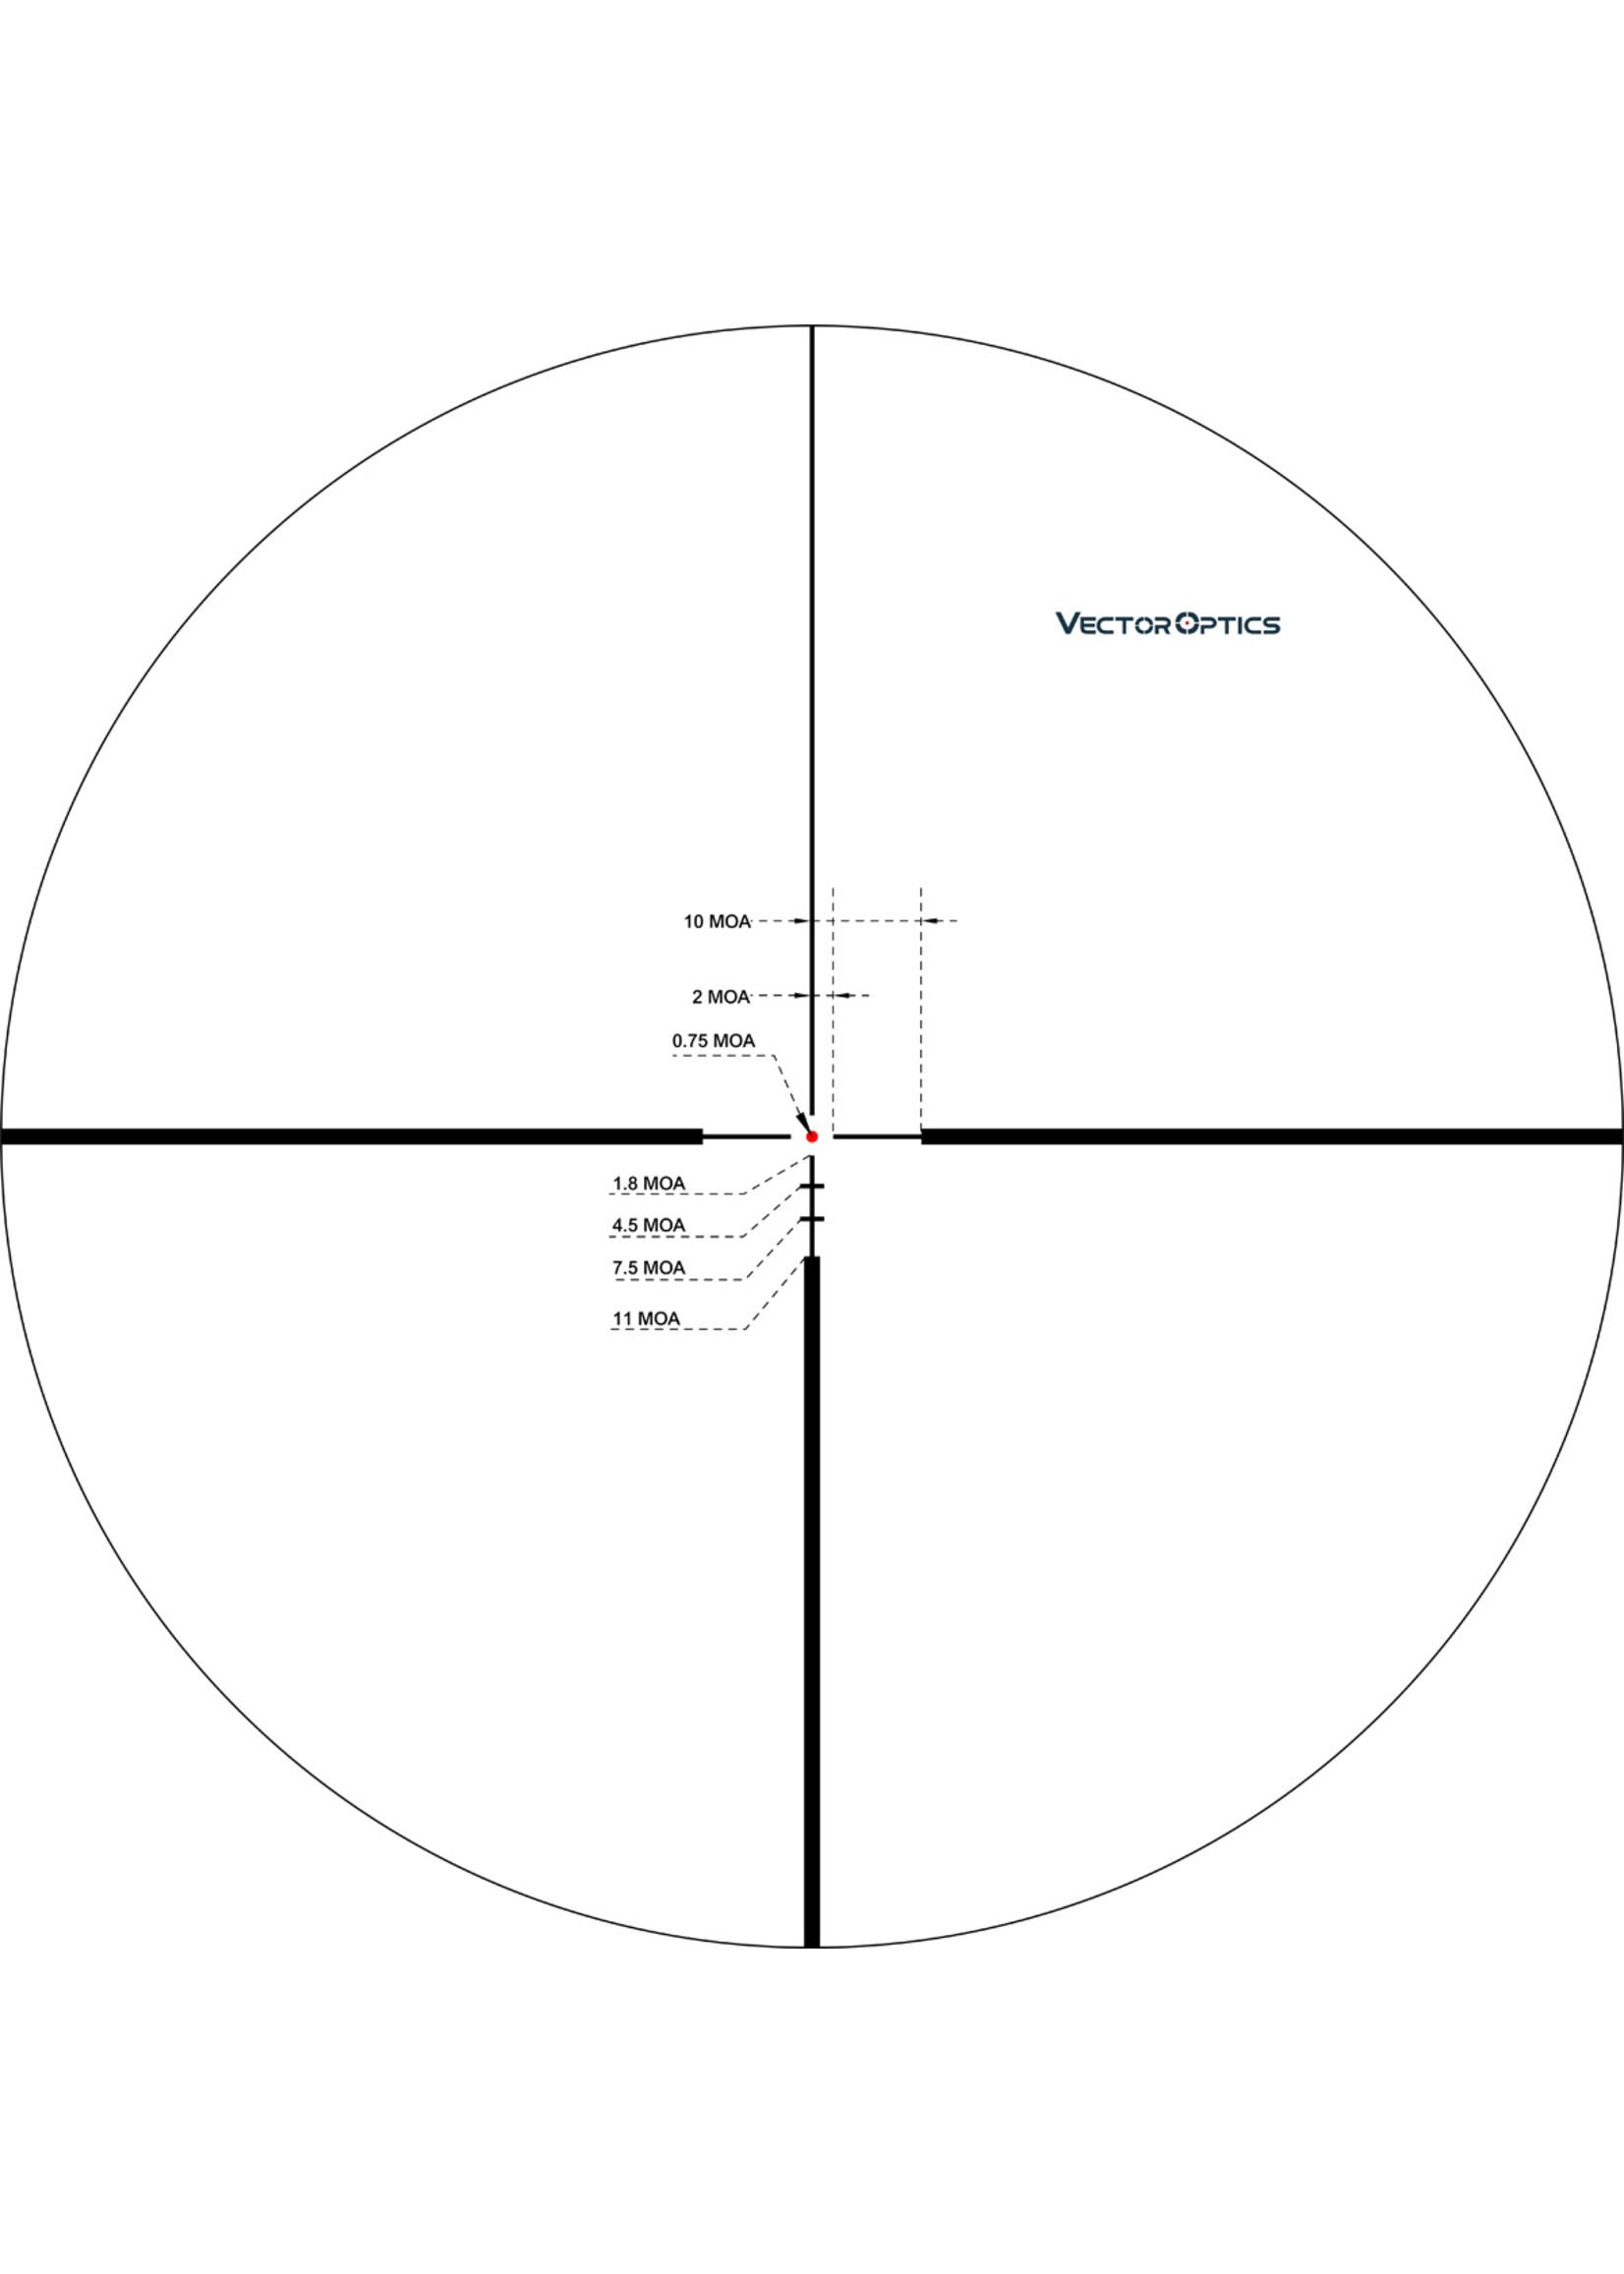 Vector Optics Vector Optics Continental High Performance Sporter Series Riflescope SFP MOA